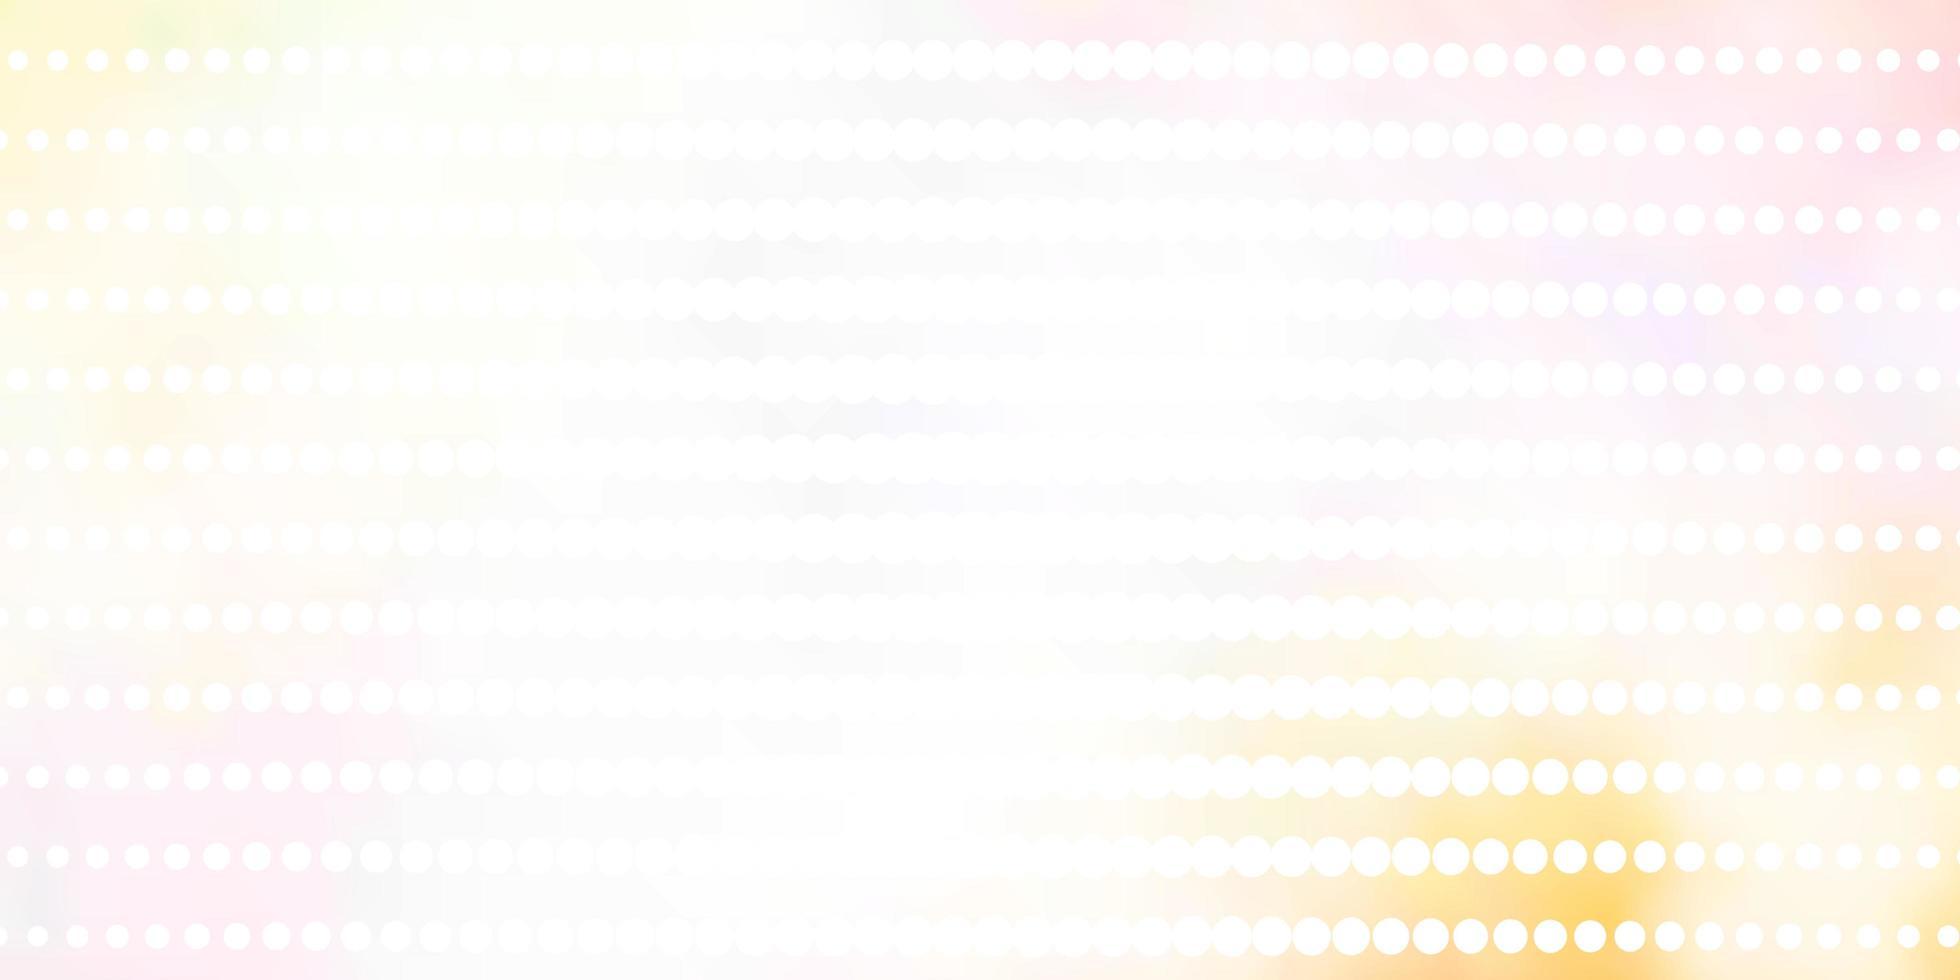 Light Orange vector pattern with circles